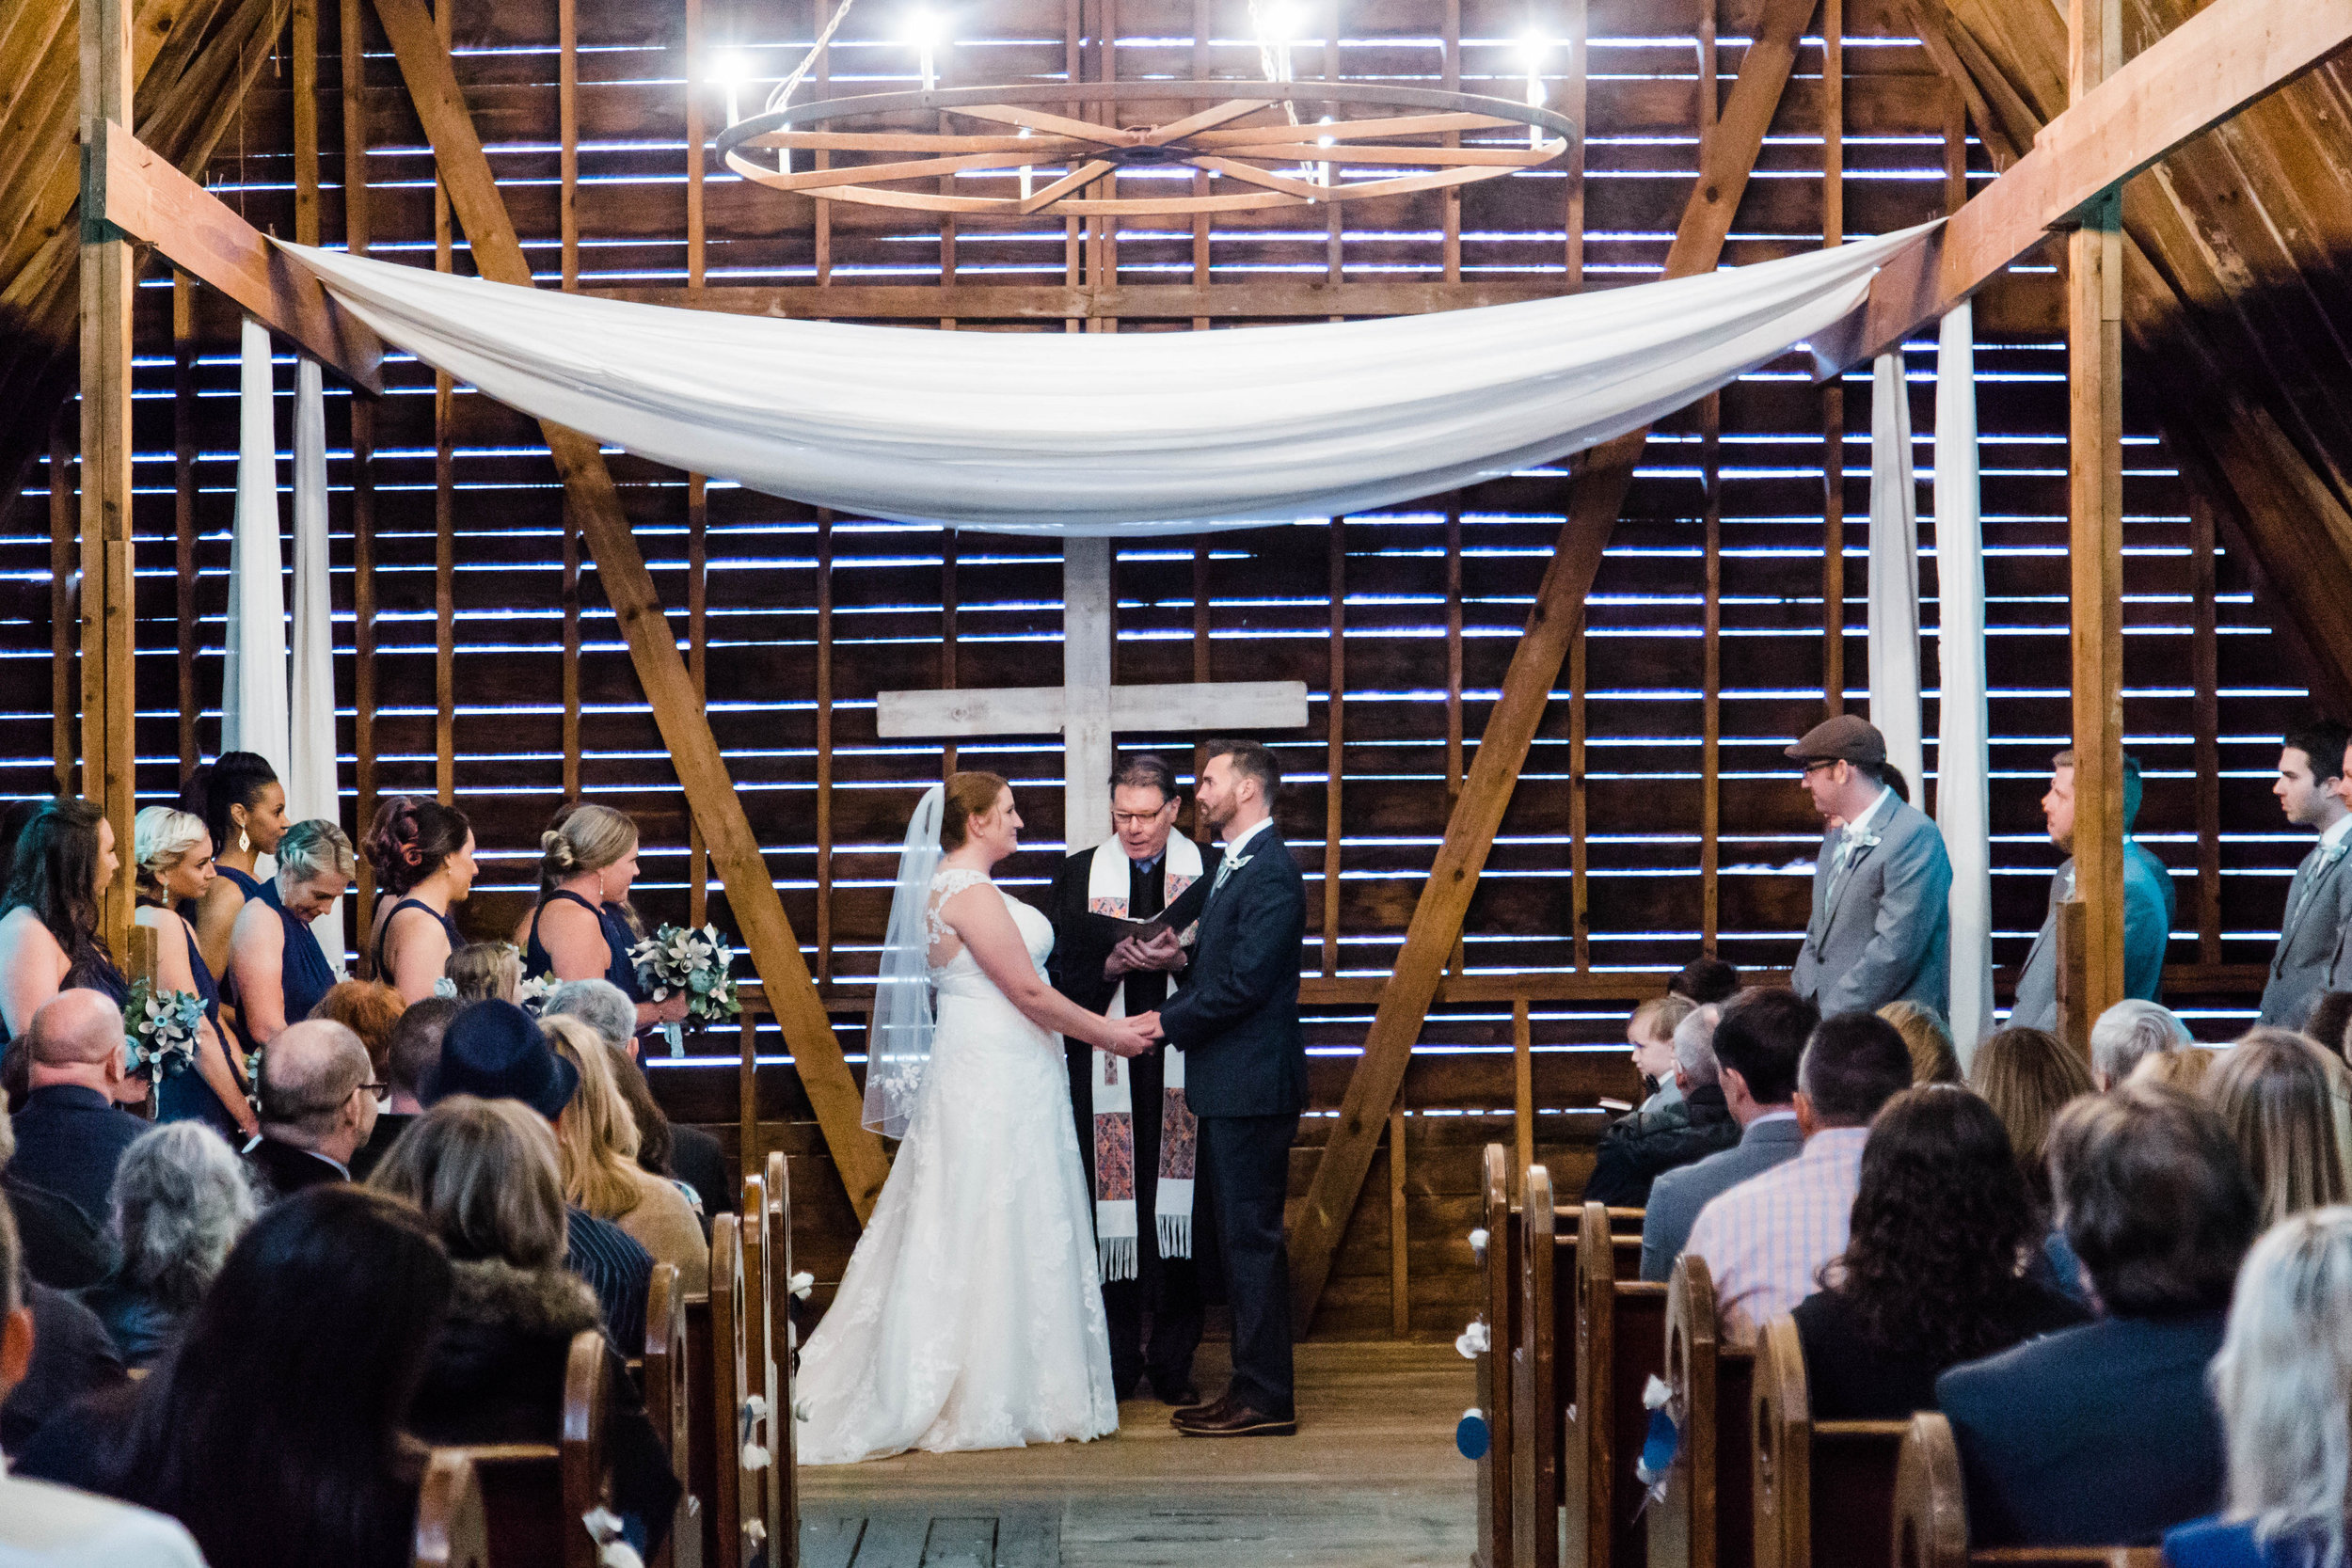 Honeysuckle-Hill-Weddings-Andrew-Rachel-186.jpg